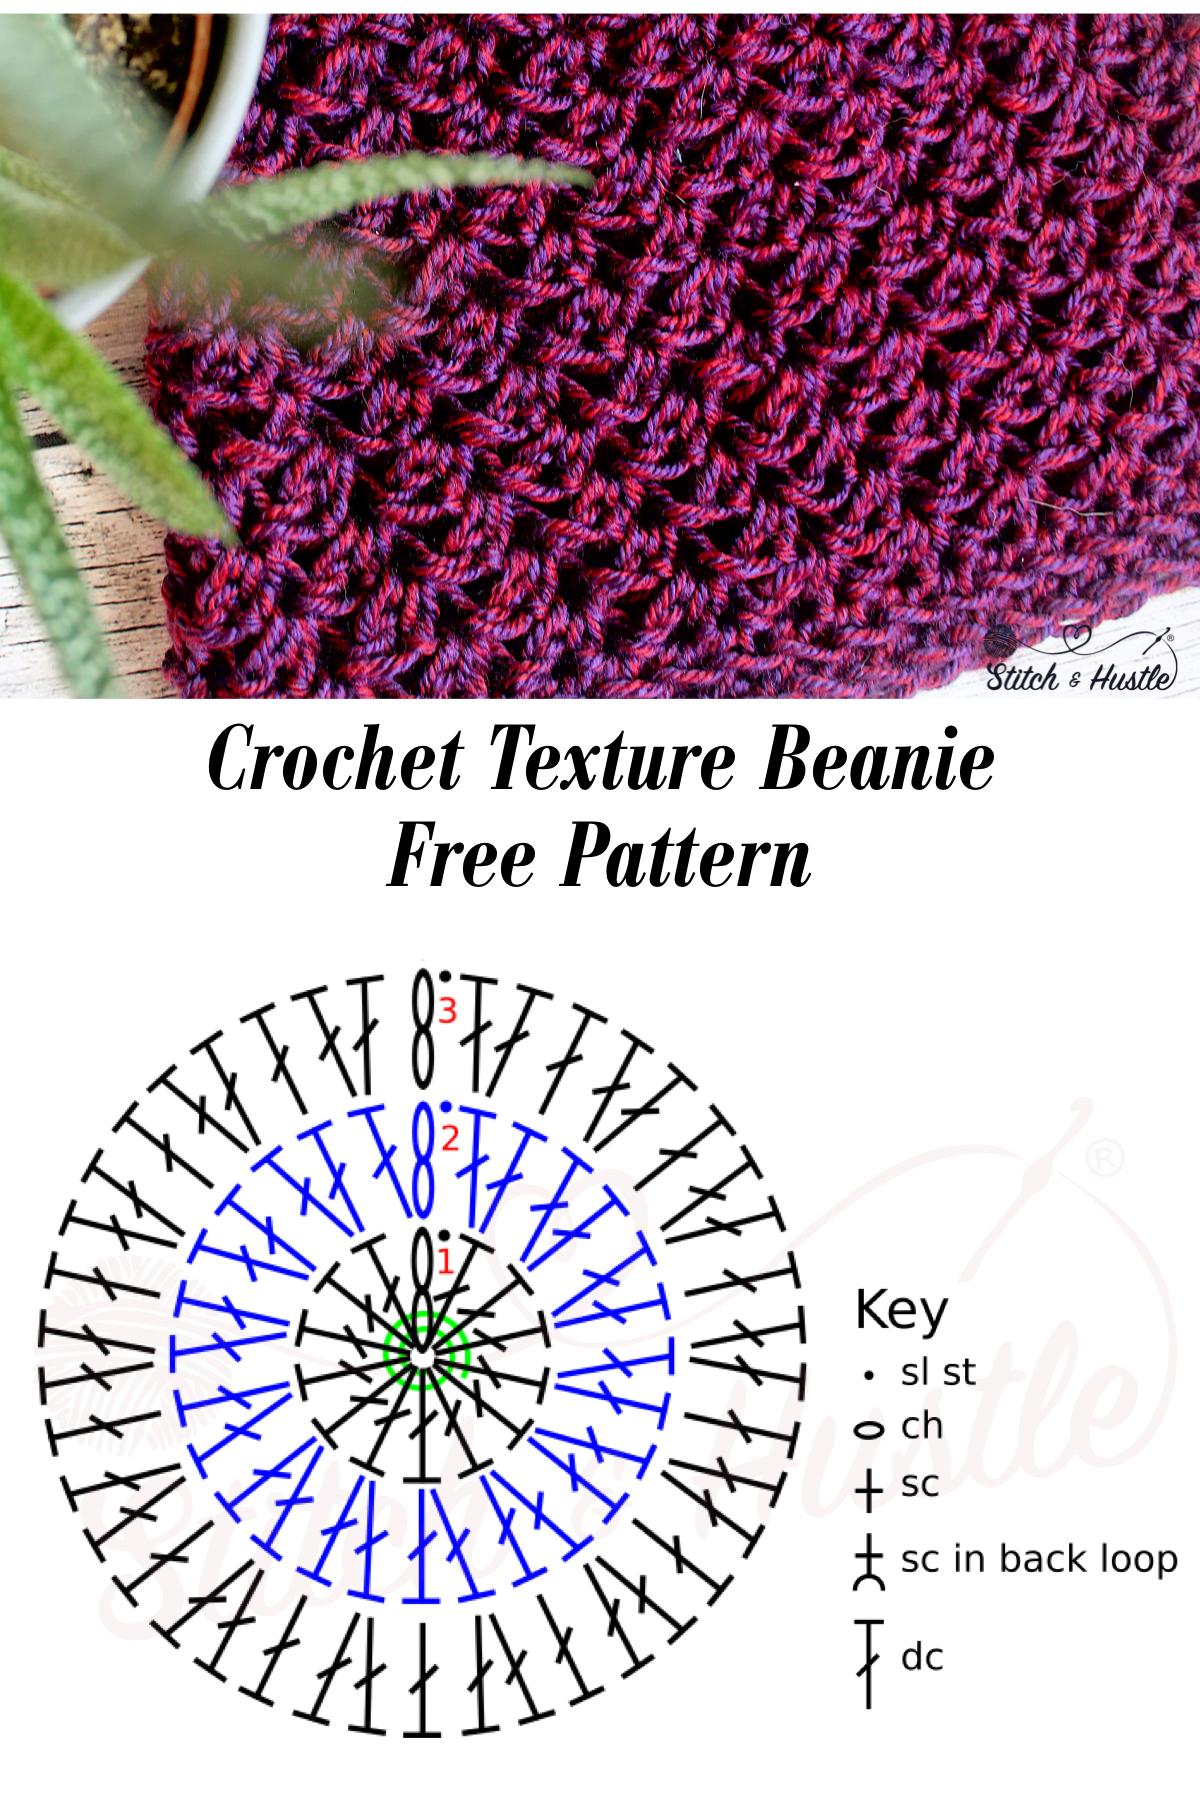 maple_texture_beanie_free_crochet_pattern_1r.jpg